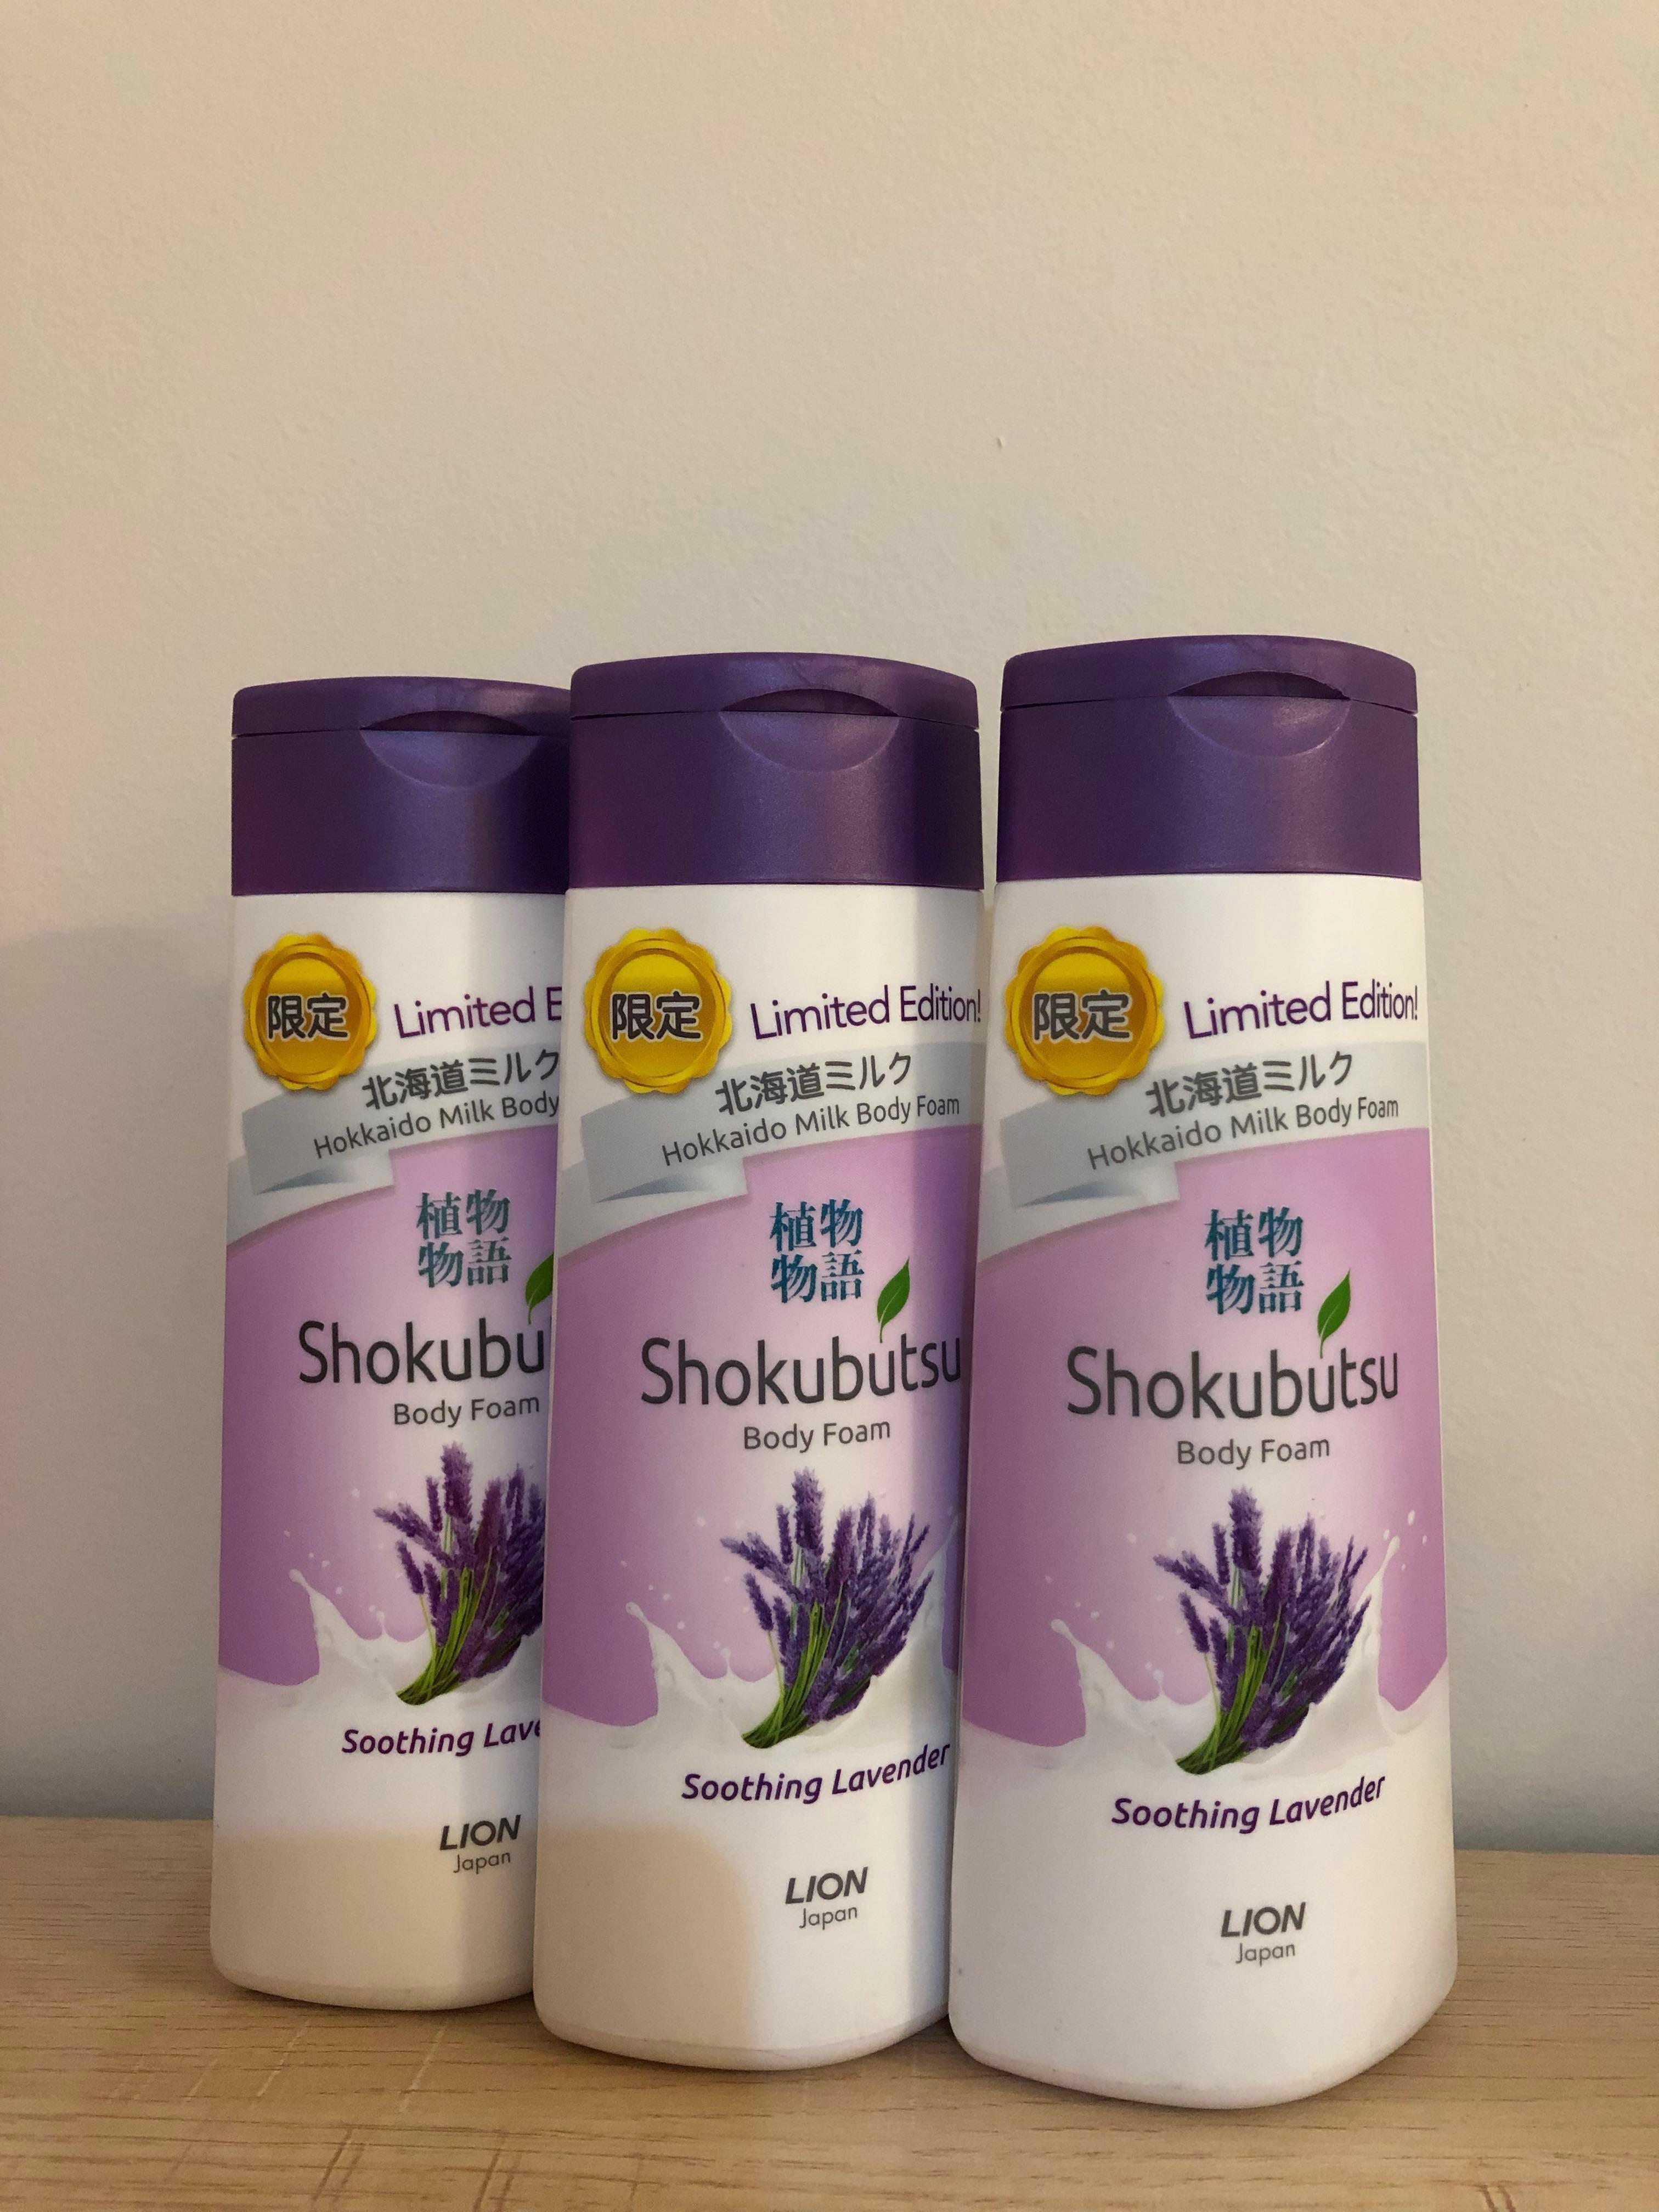 Shokubutsu Limited Edition (Hokkaido Lavender)